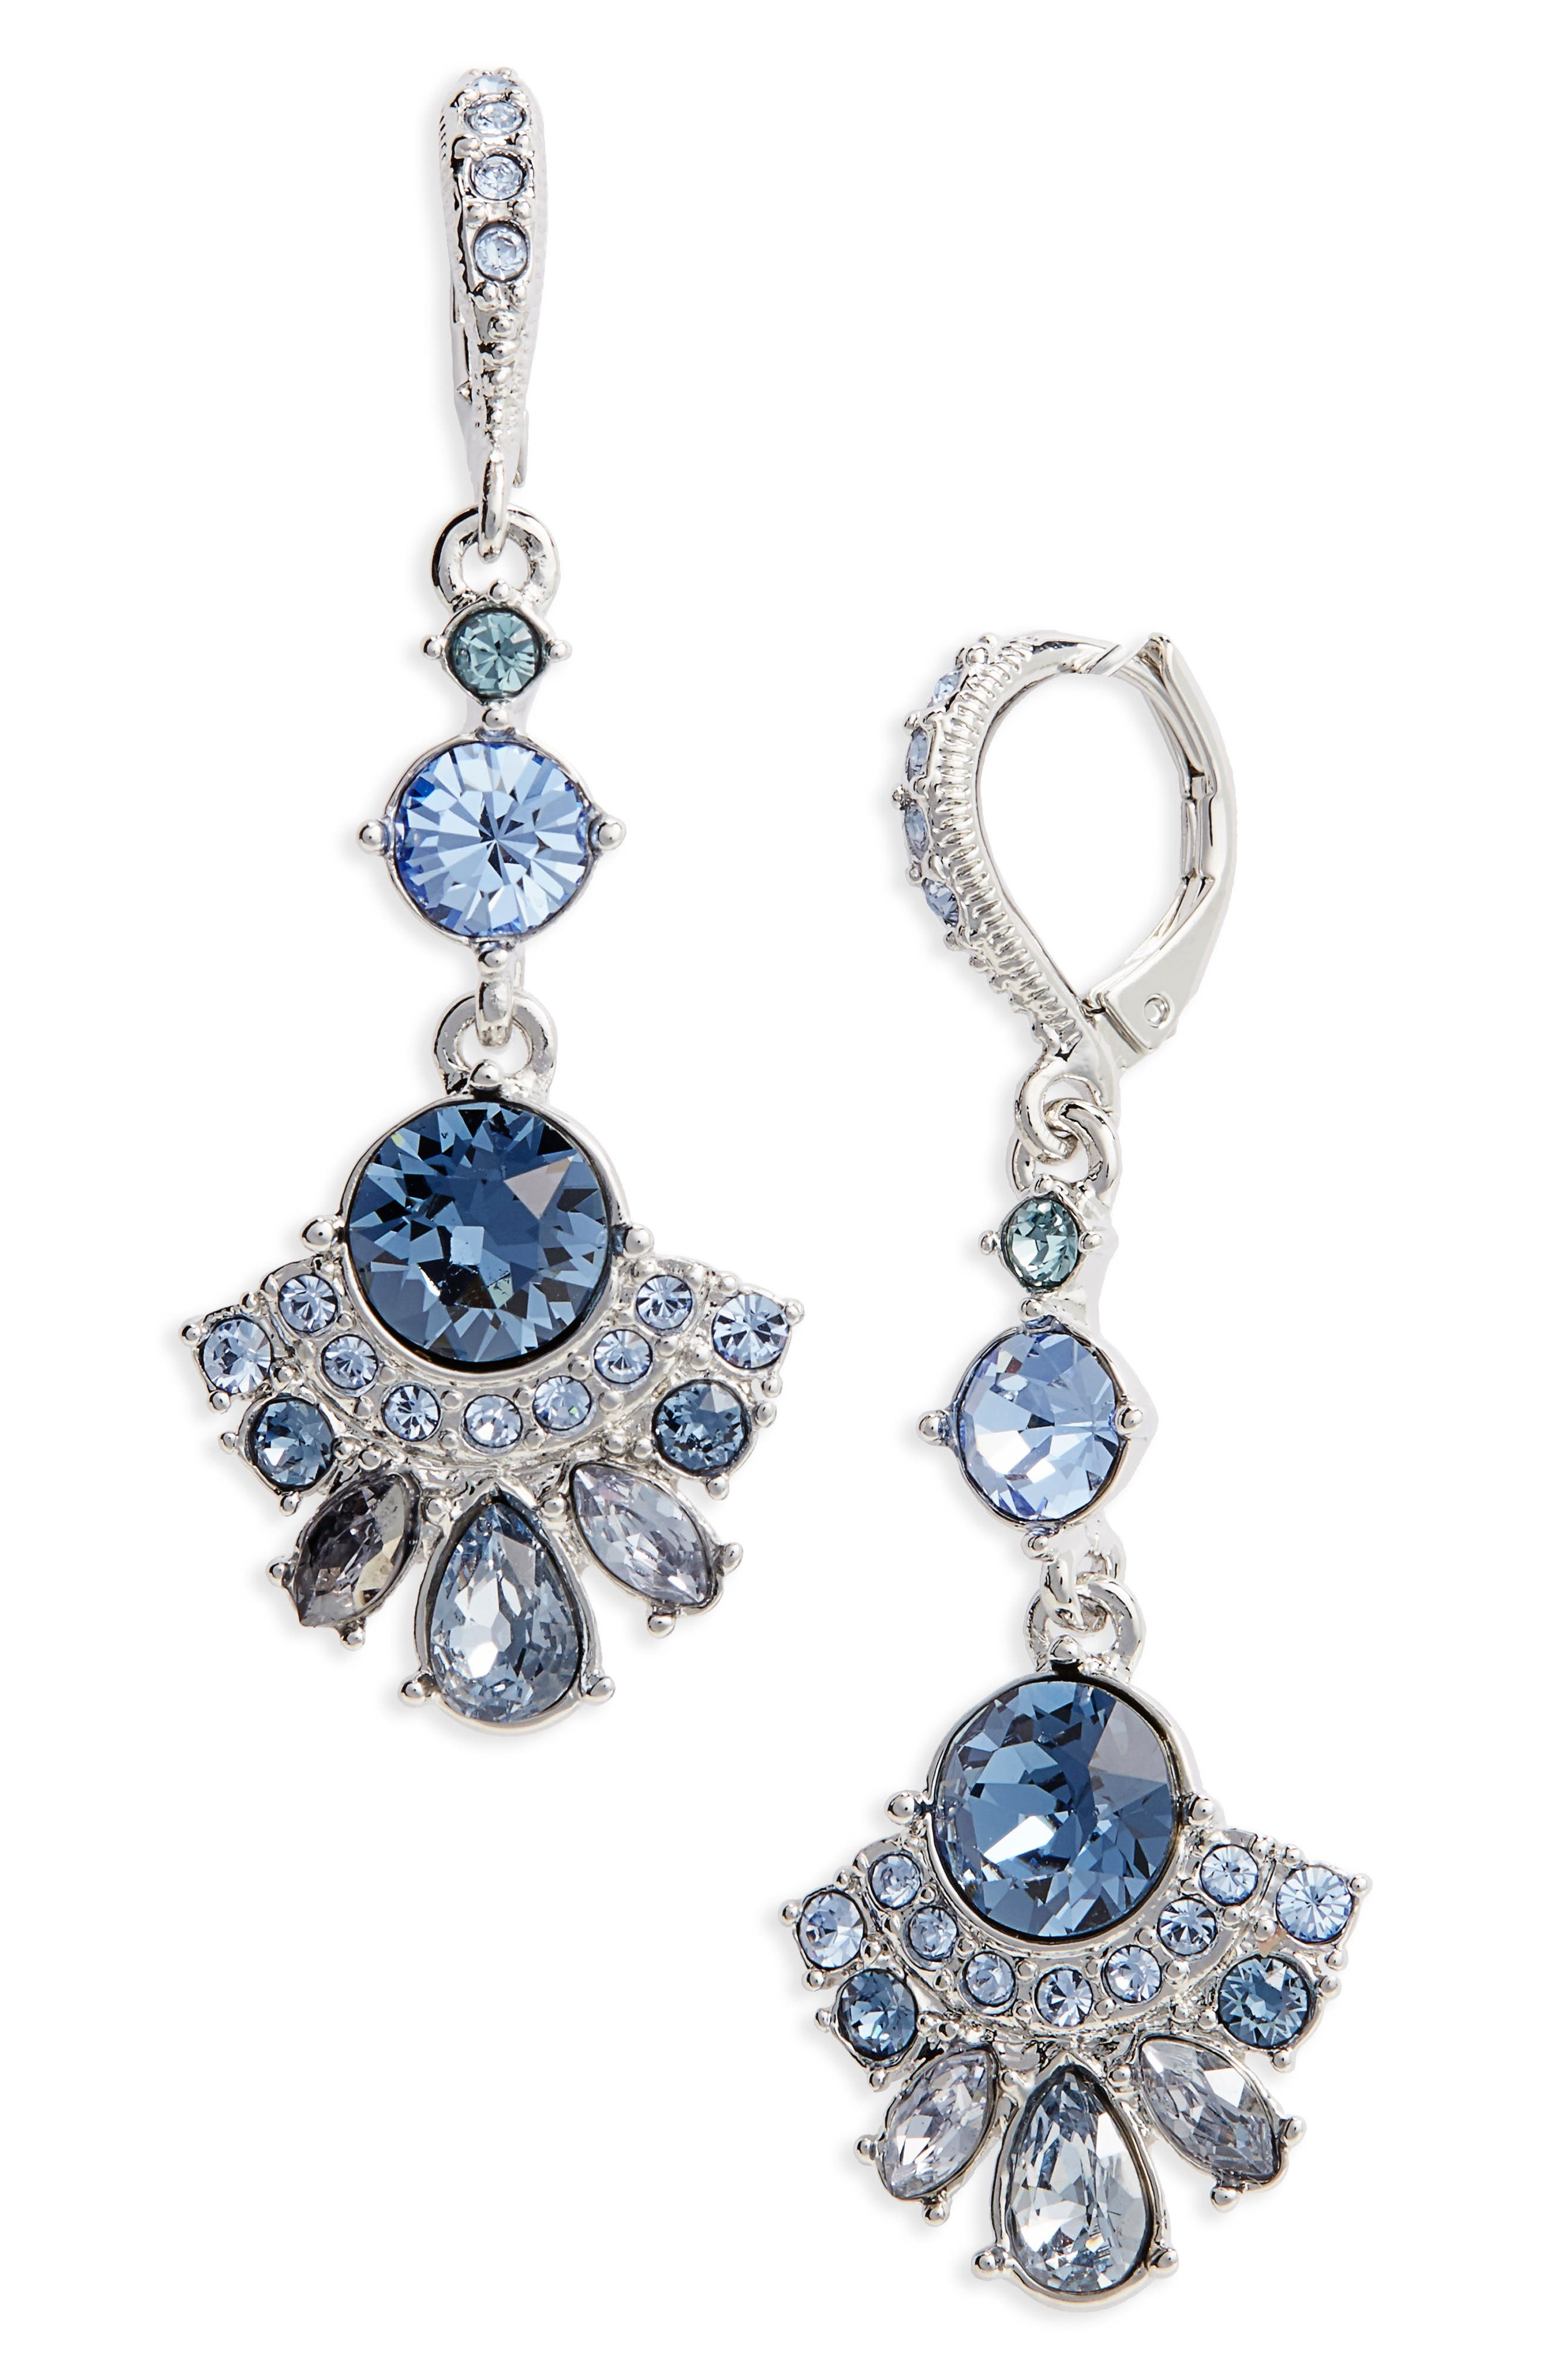 GIVENCHY Verona Drop Earrings